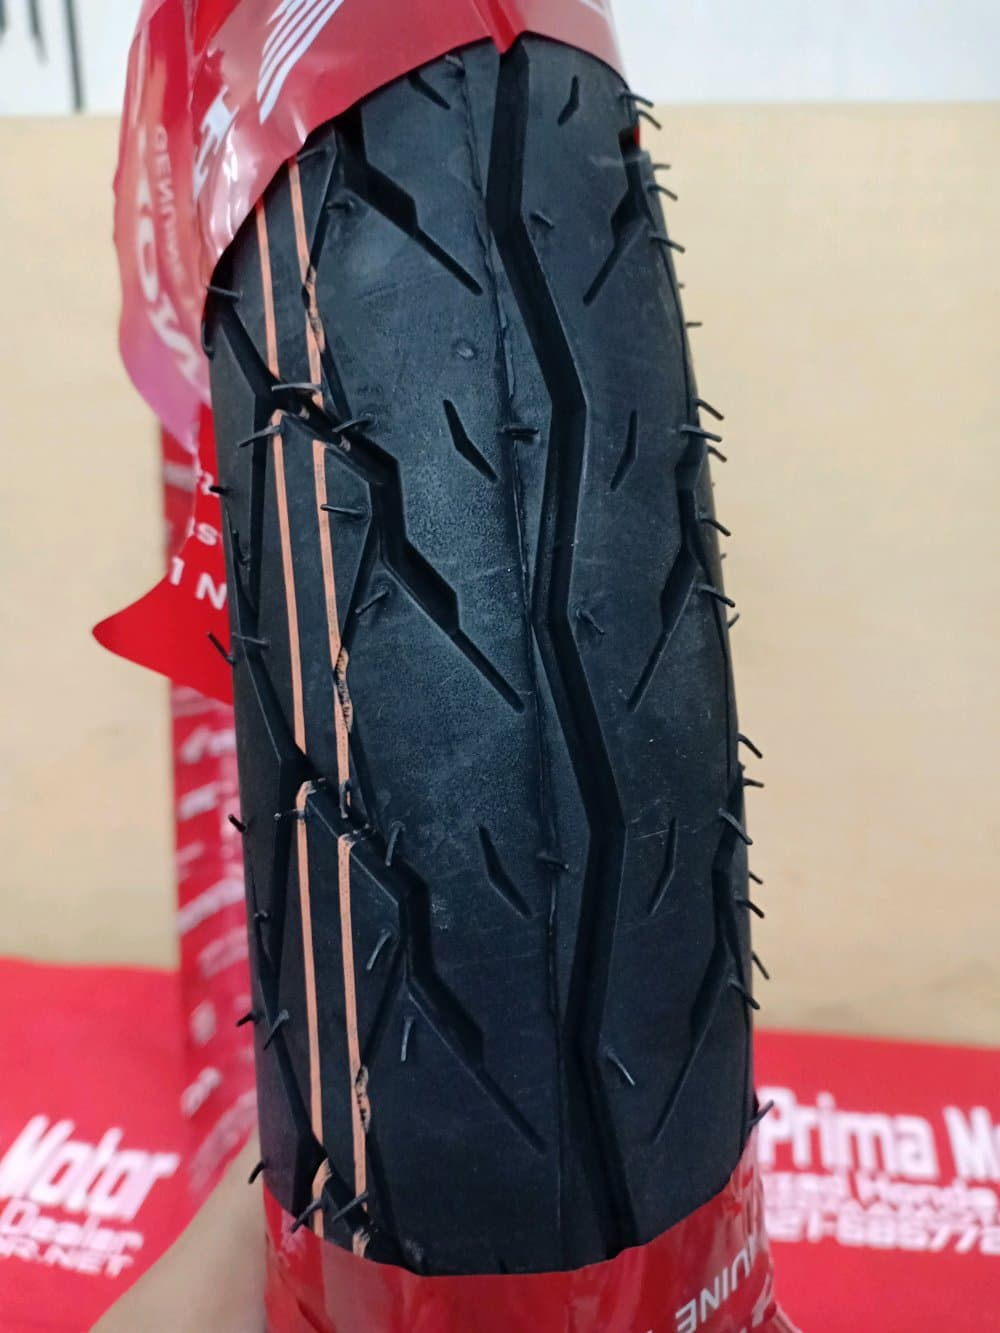 BELI Ban Luar Belakang Motor Bebek Honda 80 90 Ring 17 IRC 42711KWB922 aaf88d3b5c